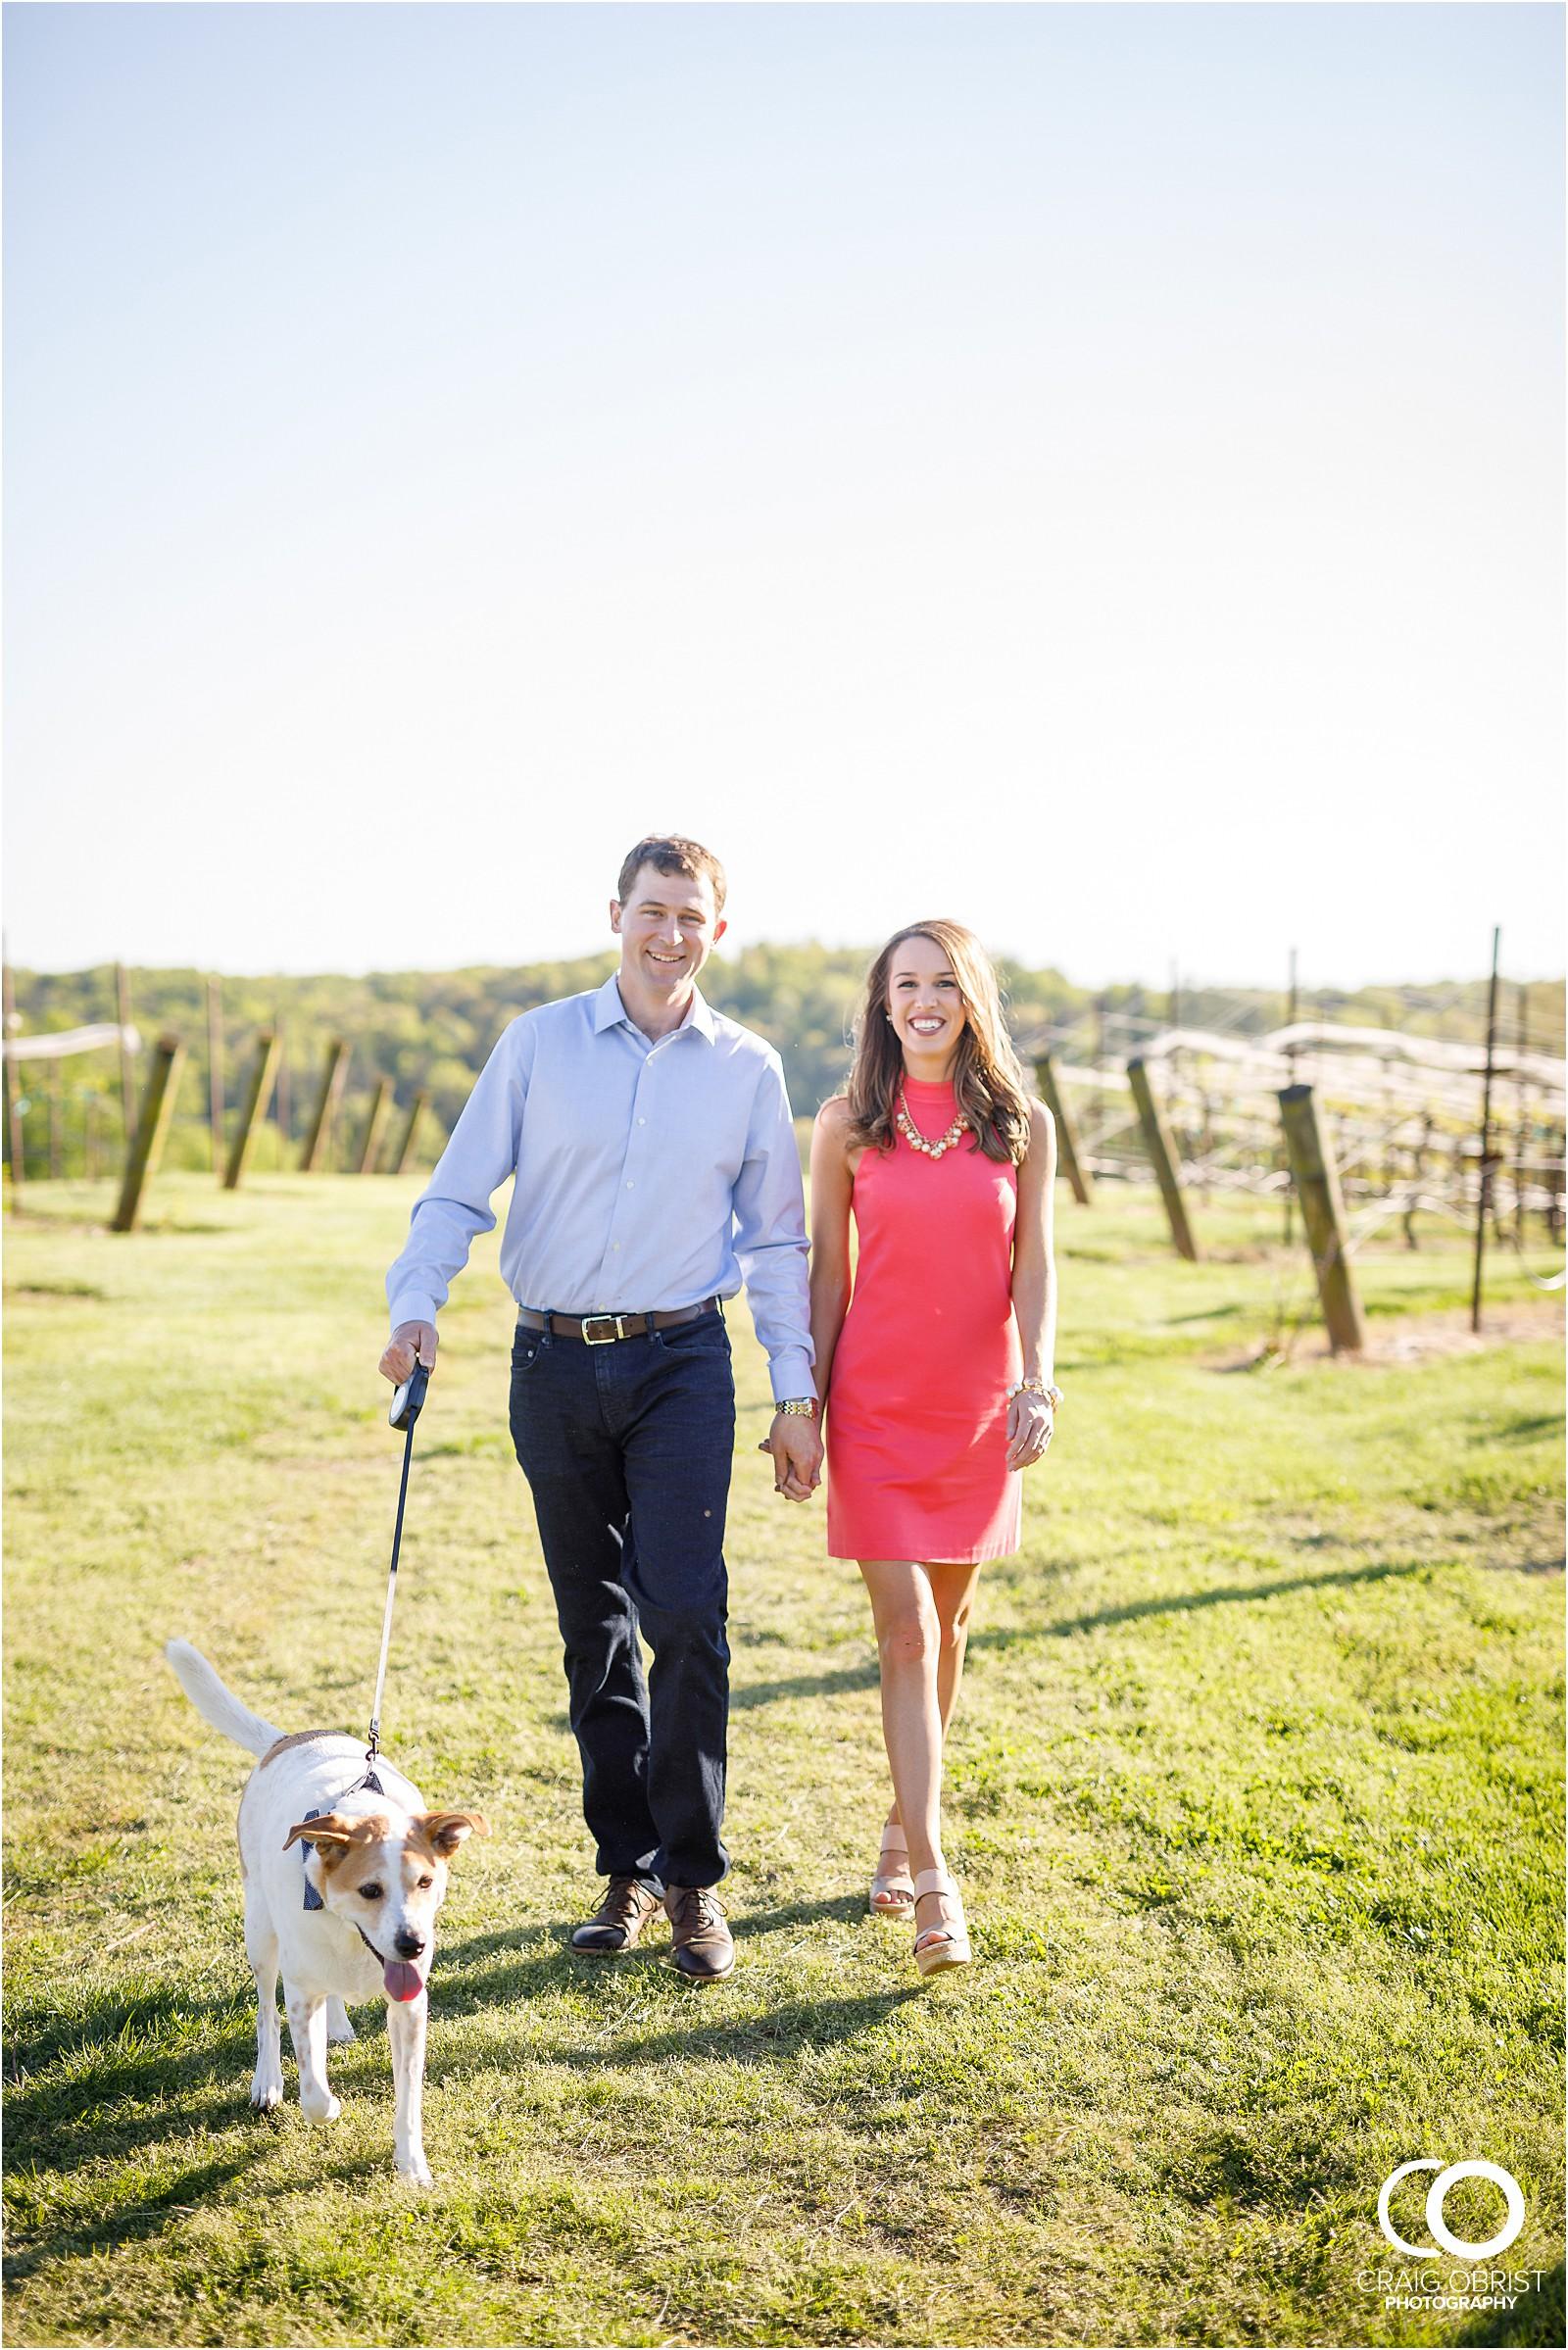 Montaluce Winery Vinyard Engagement Portraits_0008.jpg